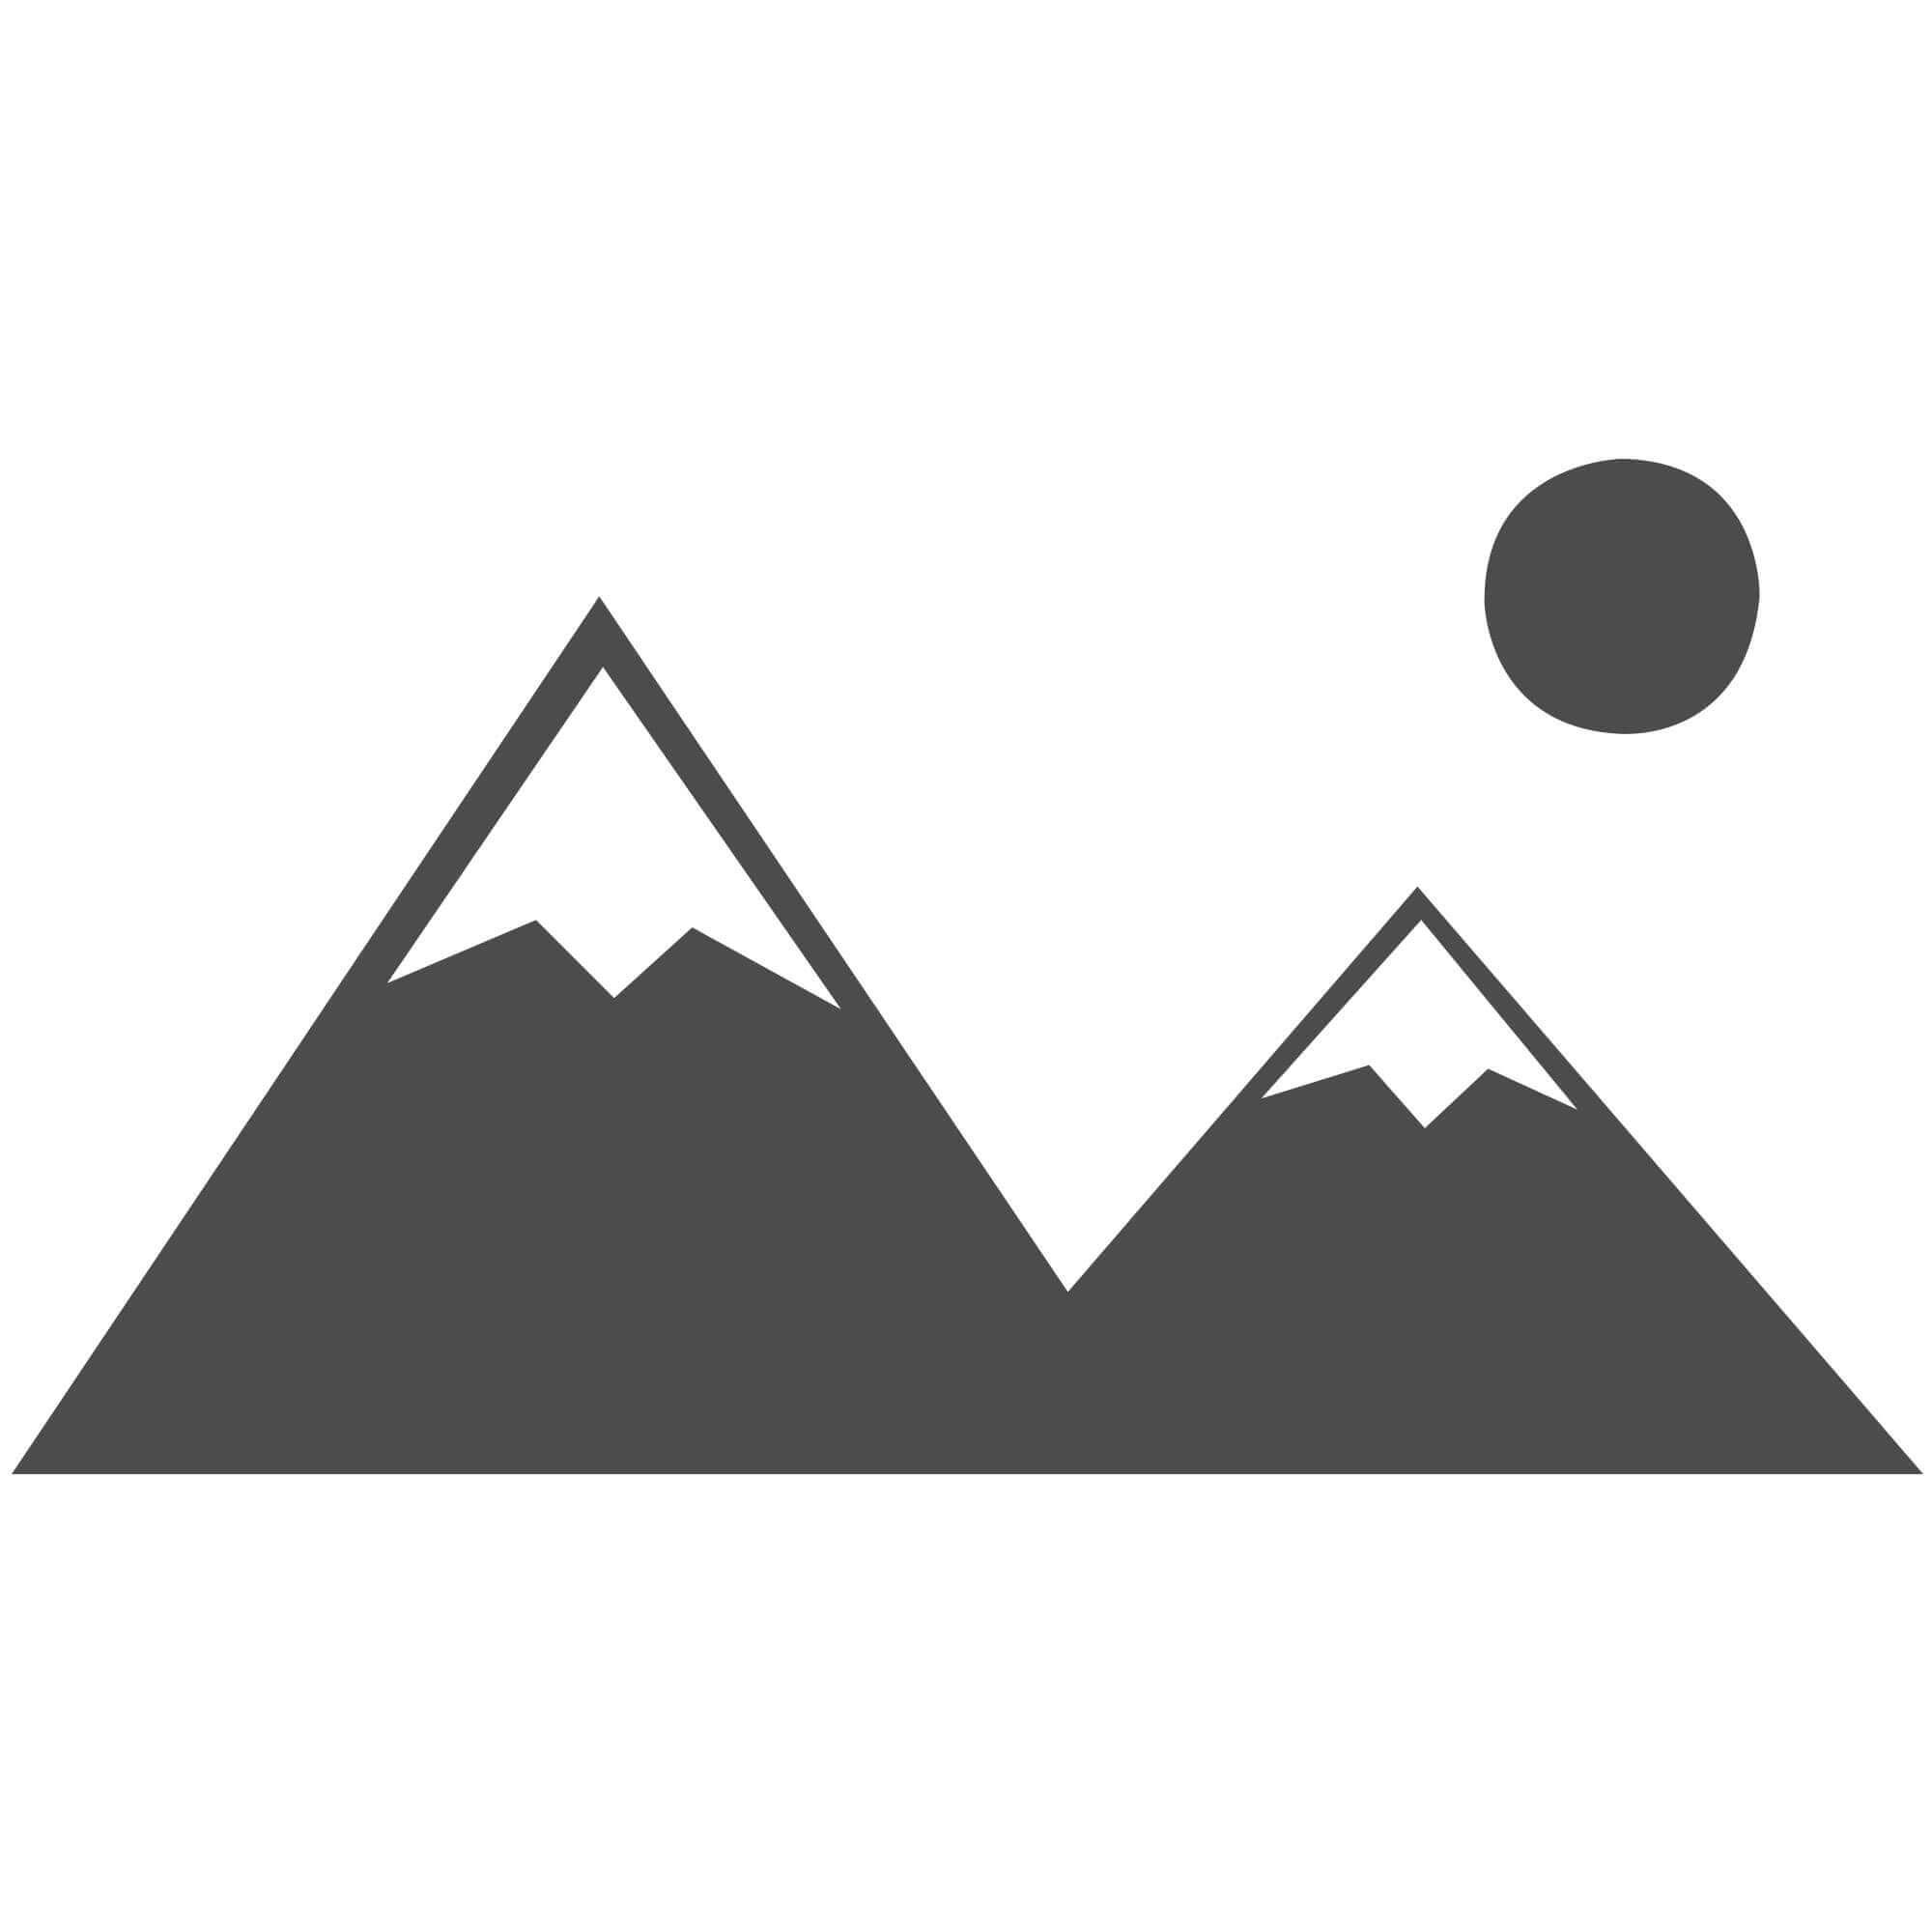 "Cascade Shaggy Rug - Smoke Brown - Size 120 x 170 cm (4' x 5'7"")"